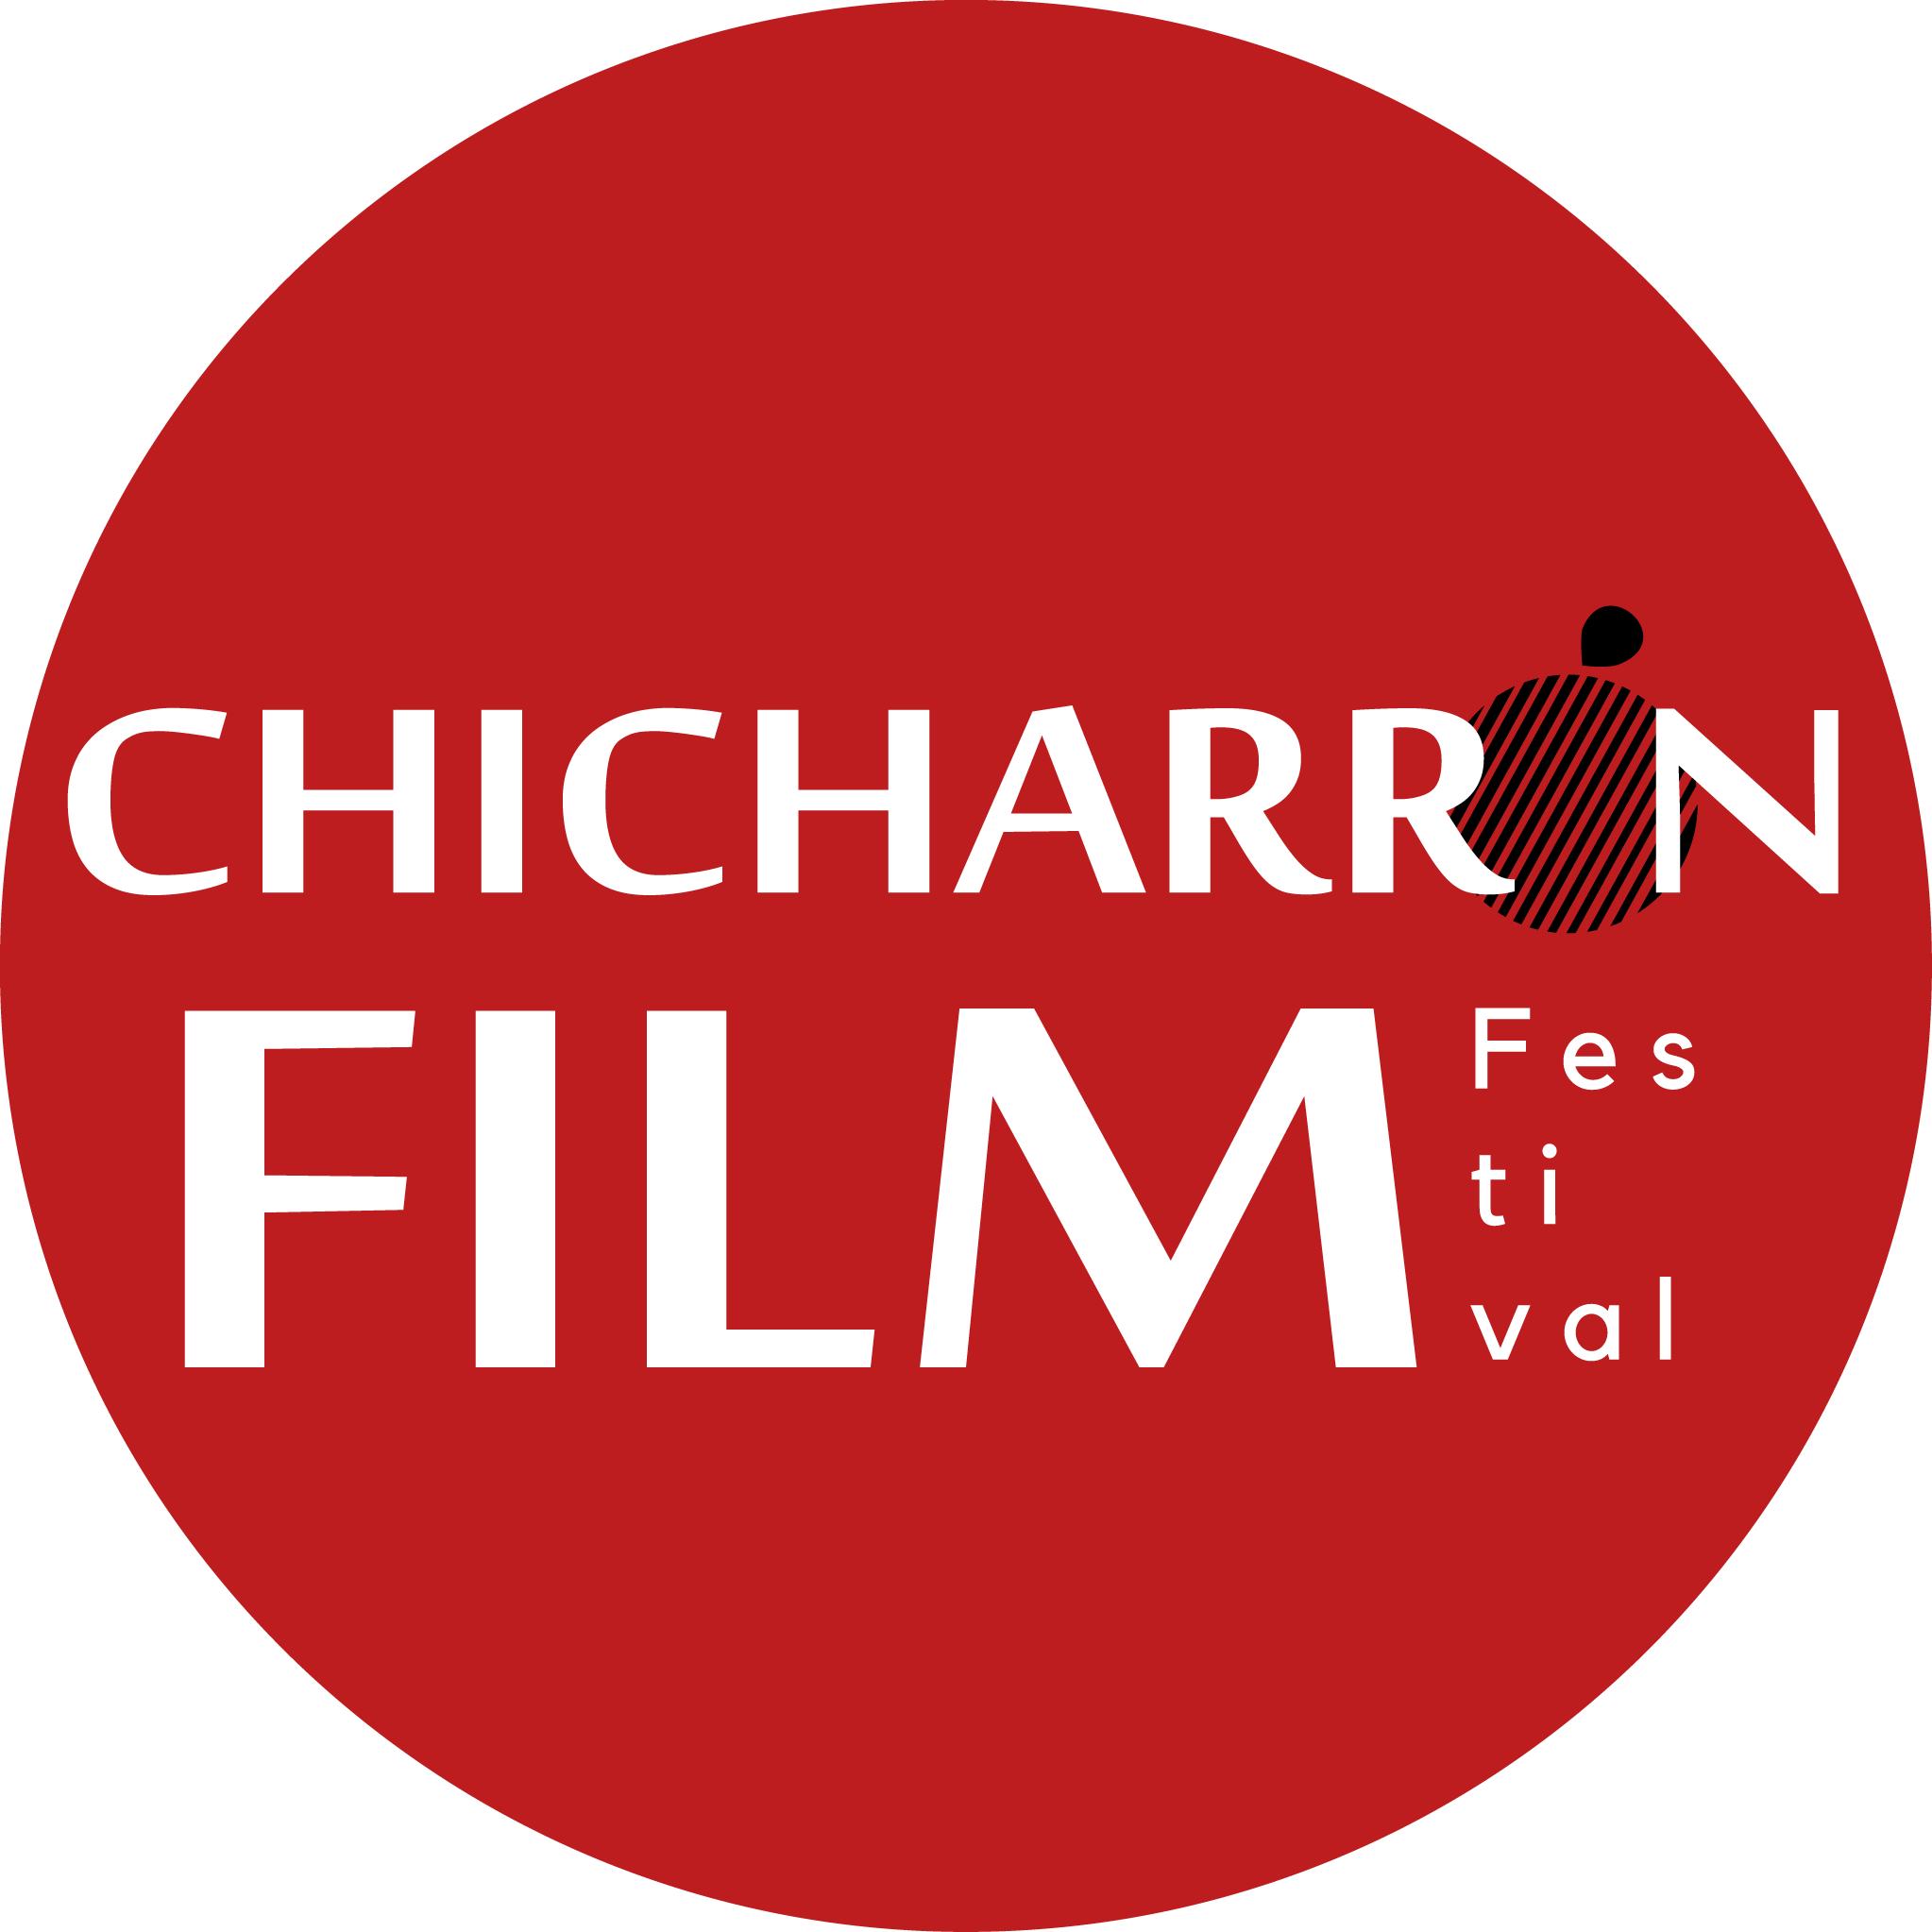 I Chicharrón Film Festival de Chiclana